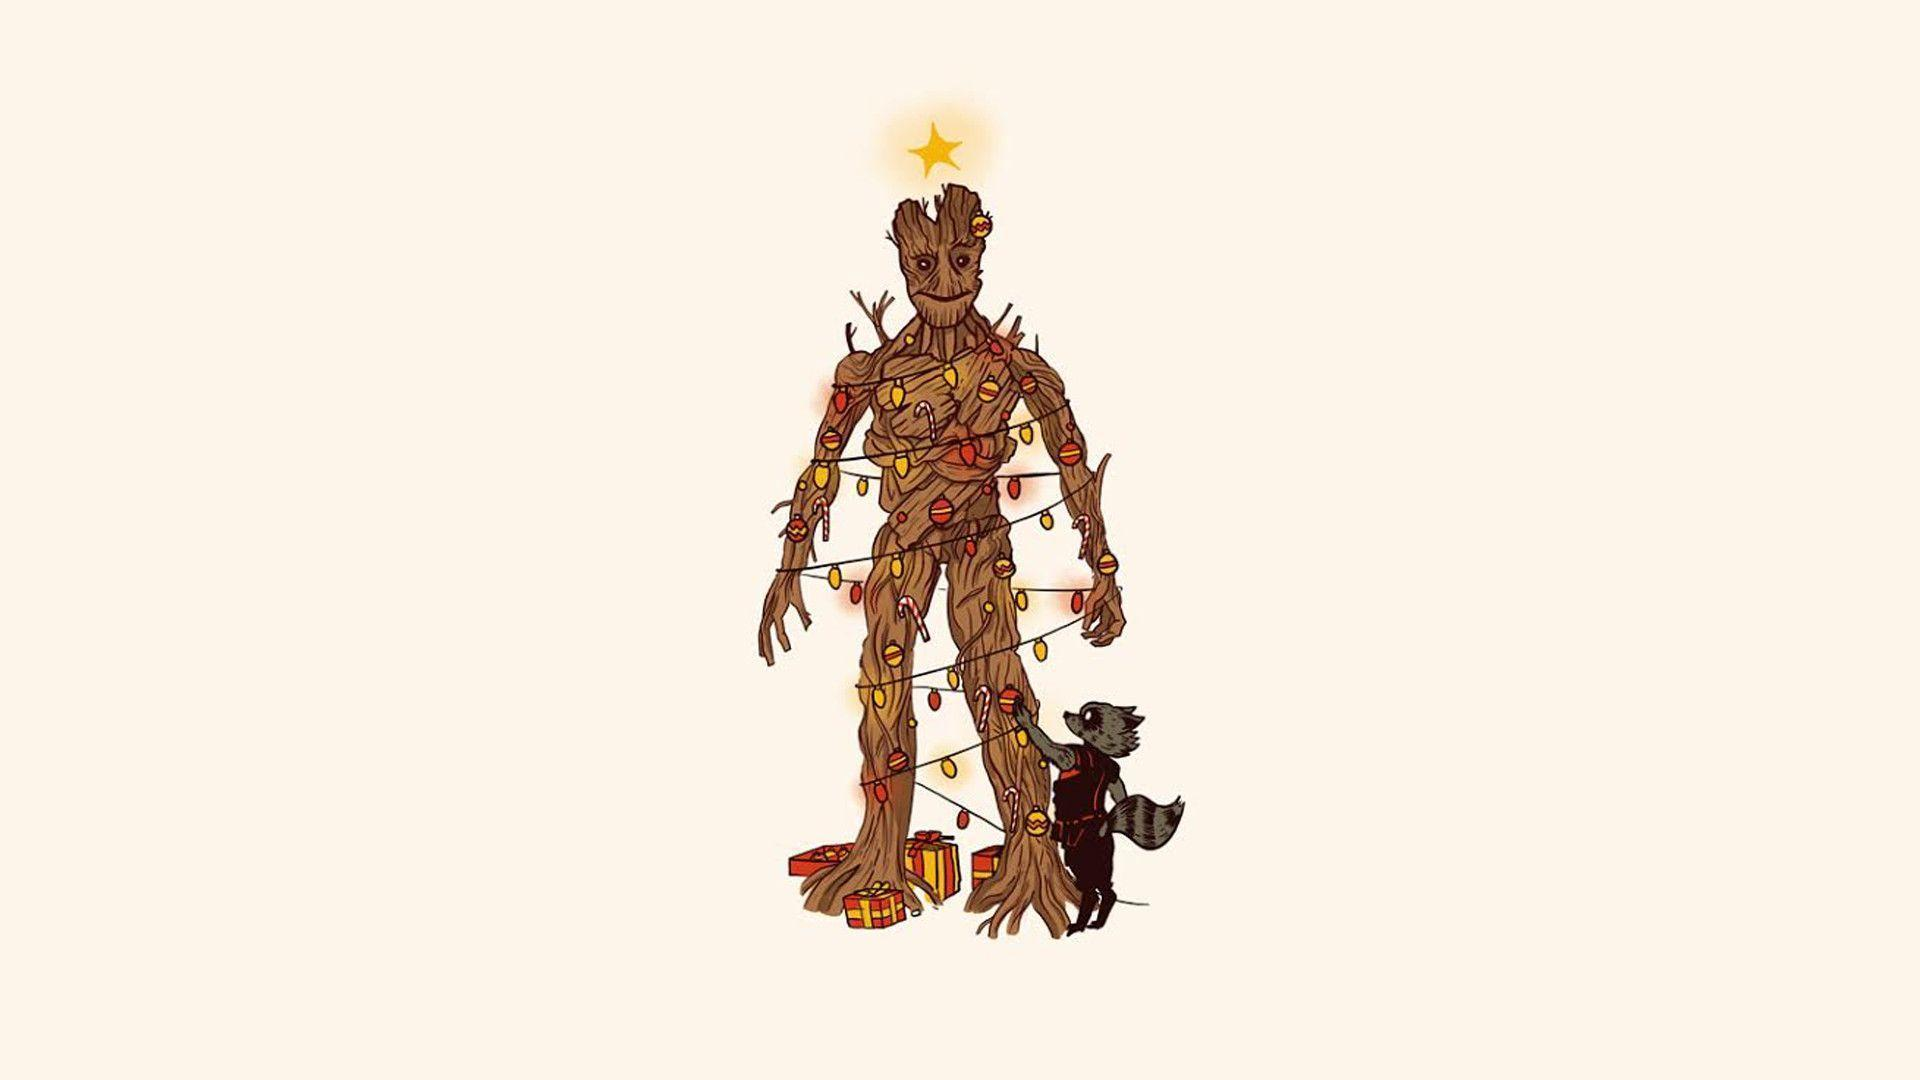 Groot Christmas Tree (1920x1080) : wallpapers